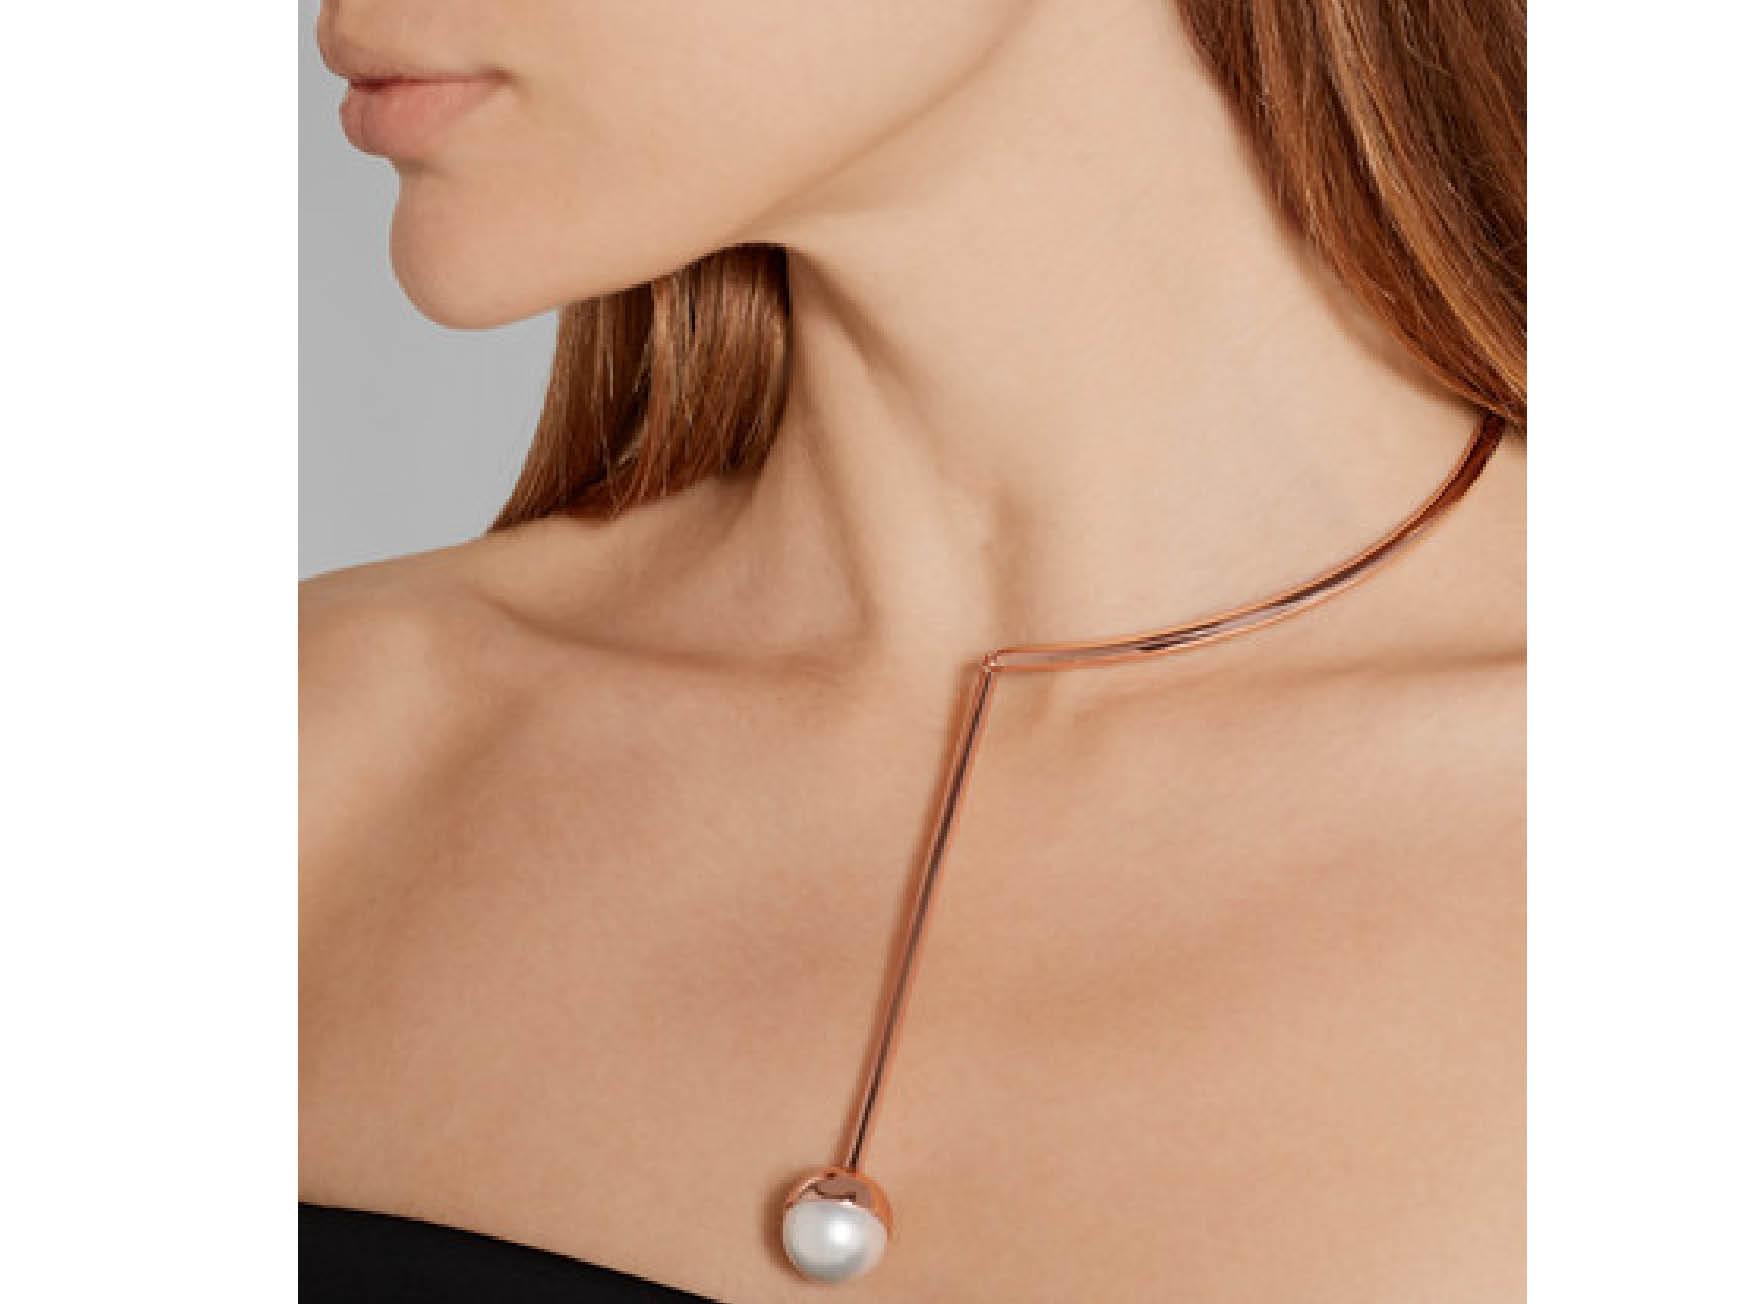 Тренд сезона: ожерелье-чокер-320x180